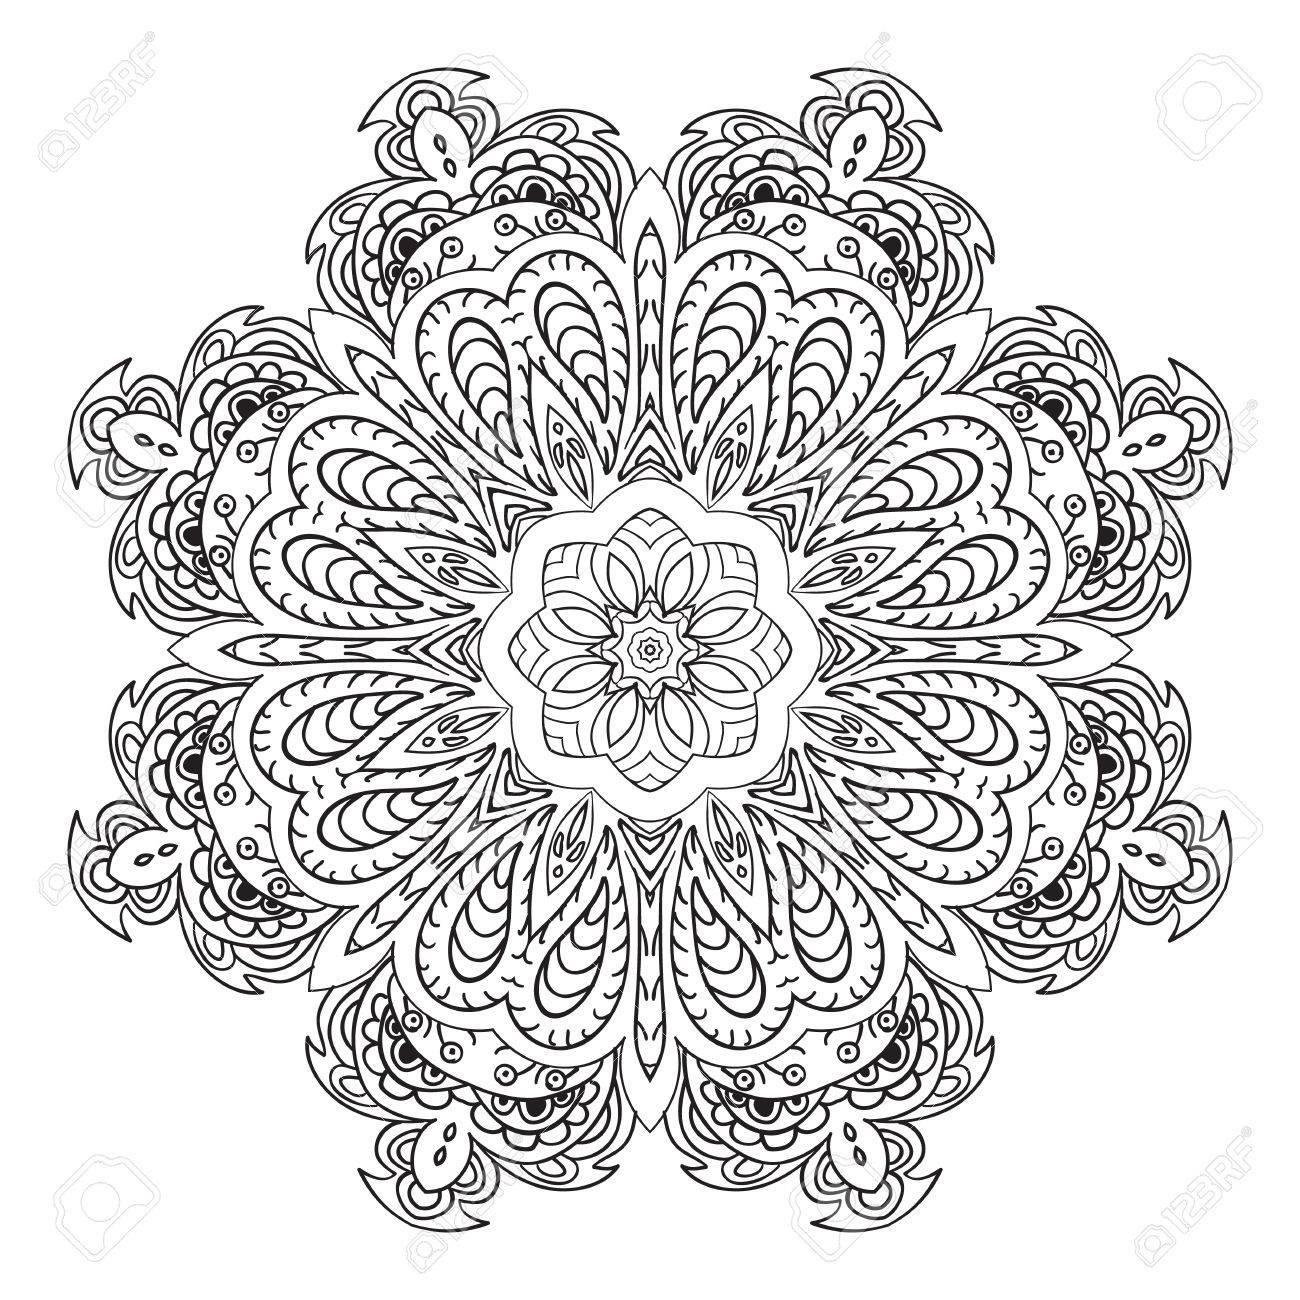 Mandala Doodle Dibujo Ornamento Floral Redondo Motivos étnicos